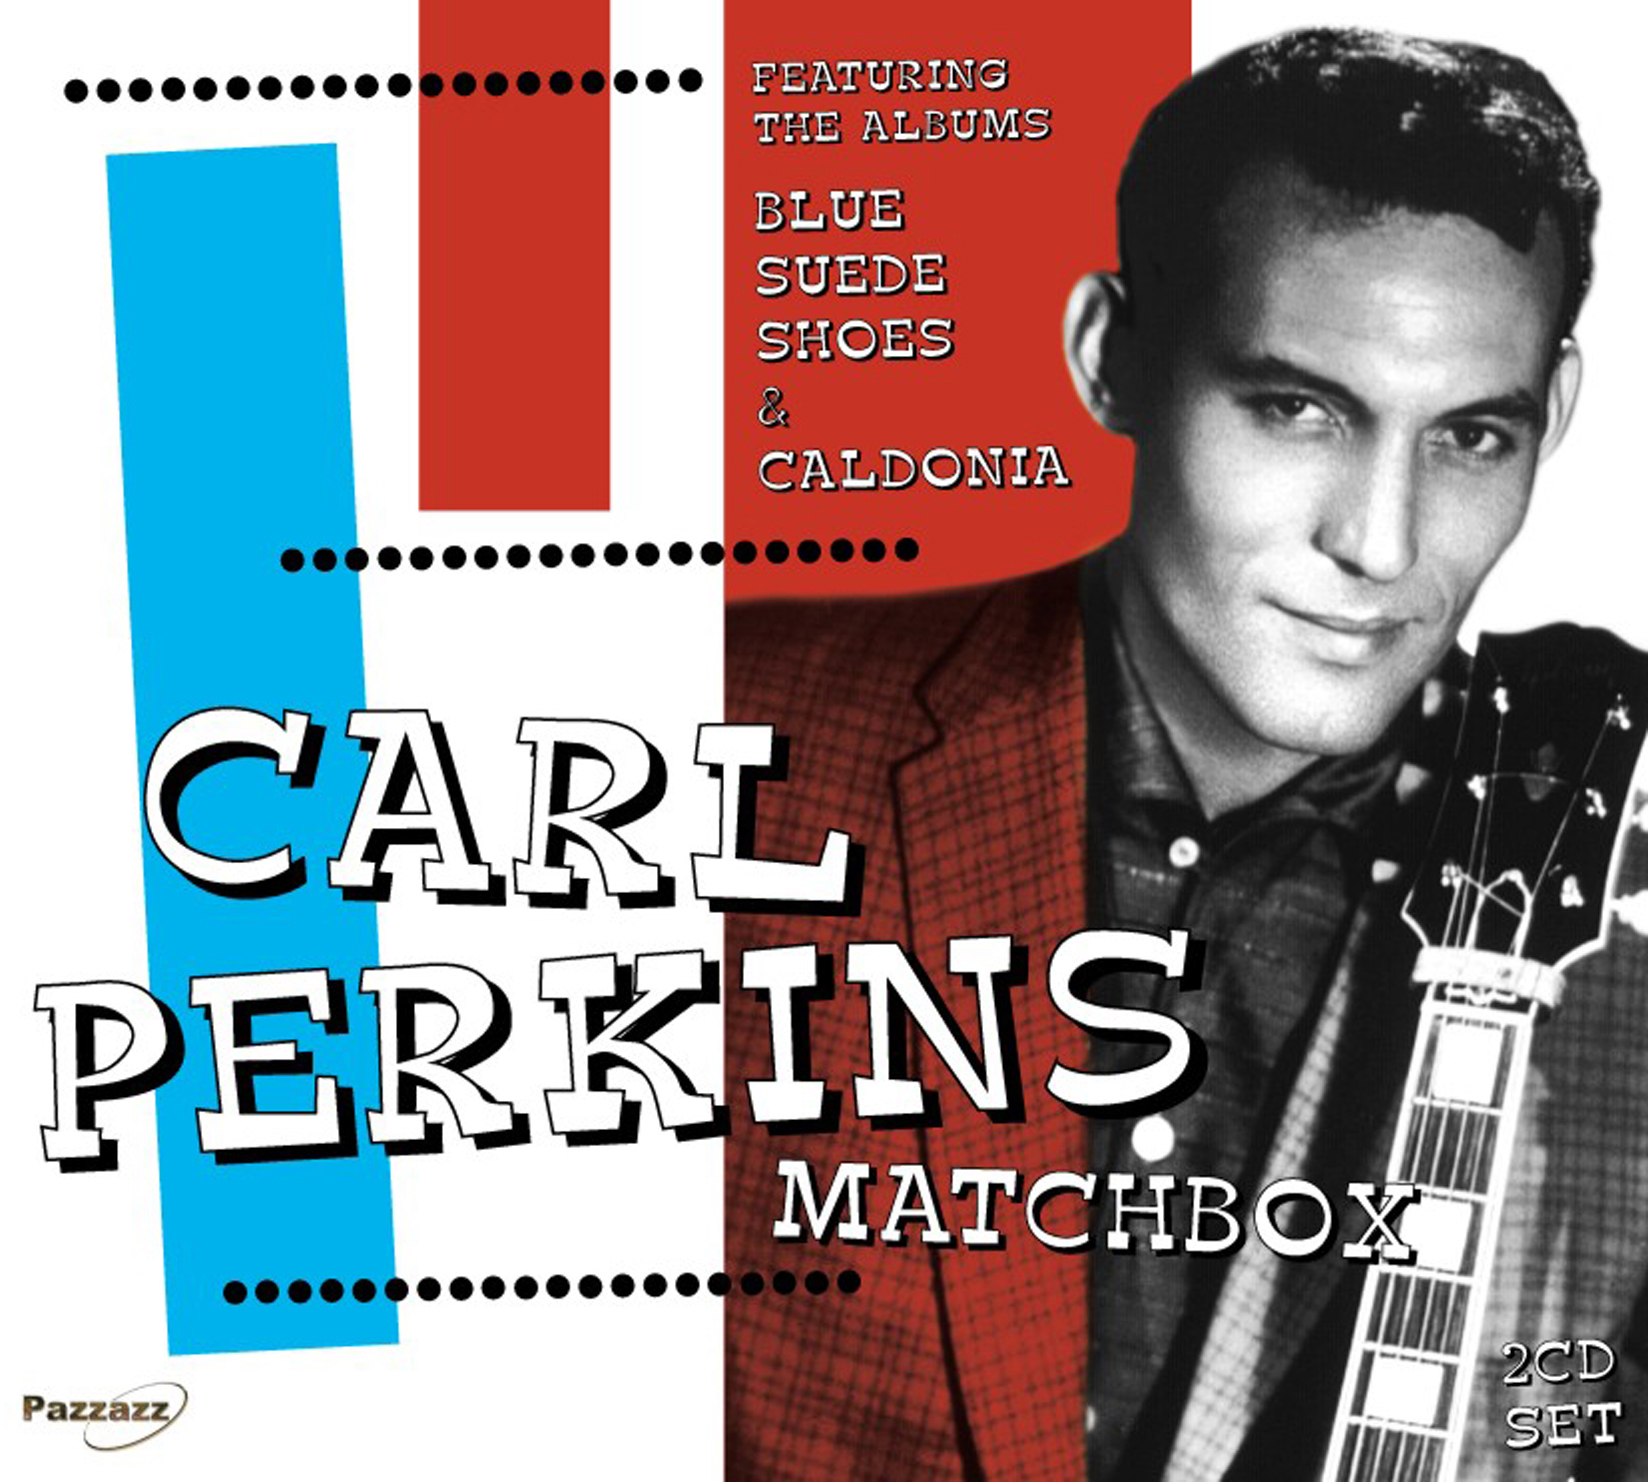 Carl Perkins Matchbox Mvd Entertainment Group B2b